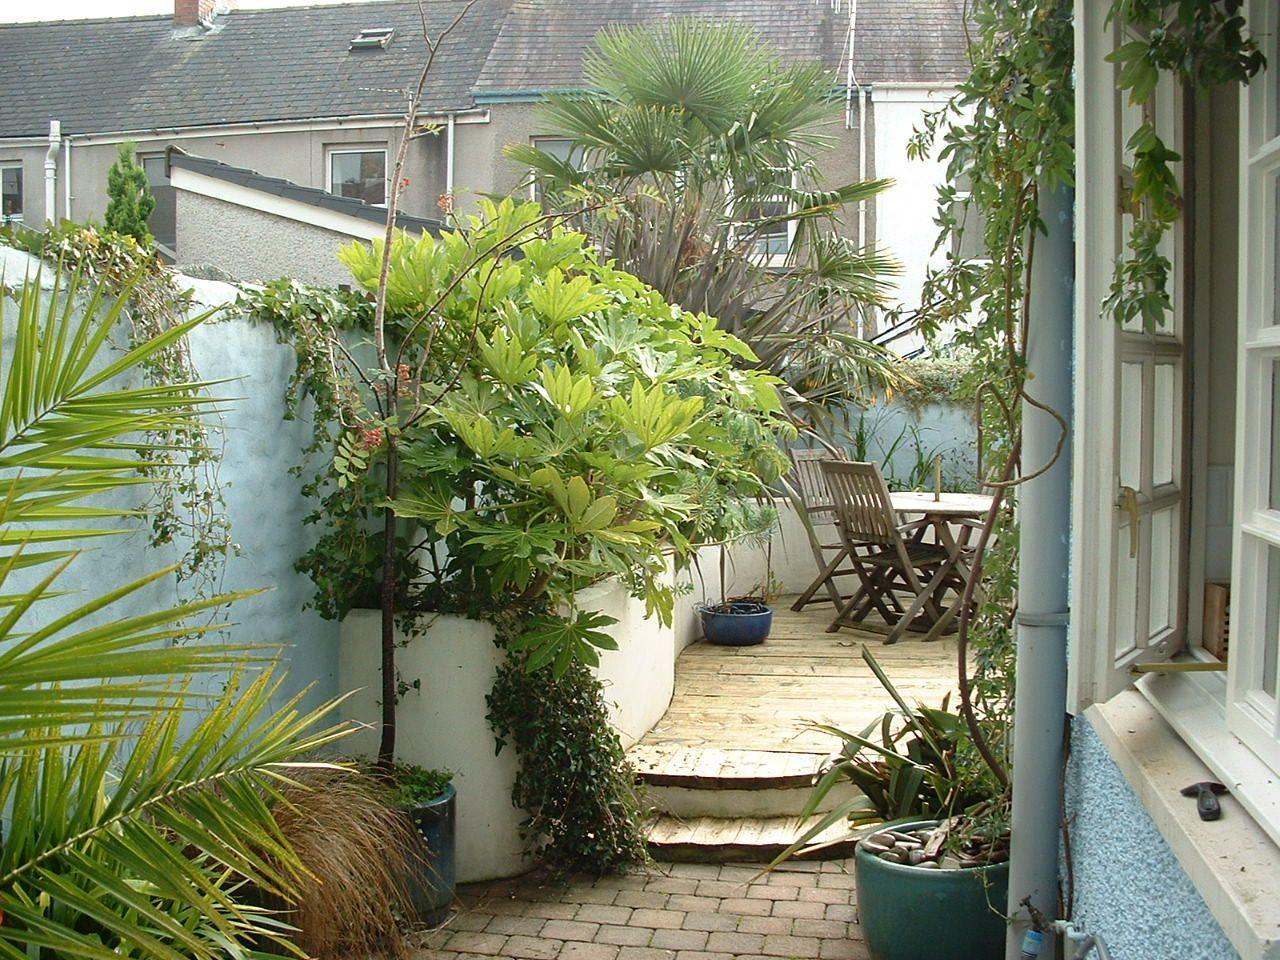 Victorian Terrace Garden (With images) | Terrace garden ... on Small Terraced House Backyard Ideas id=46070